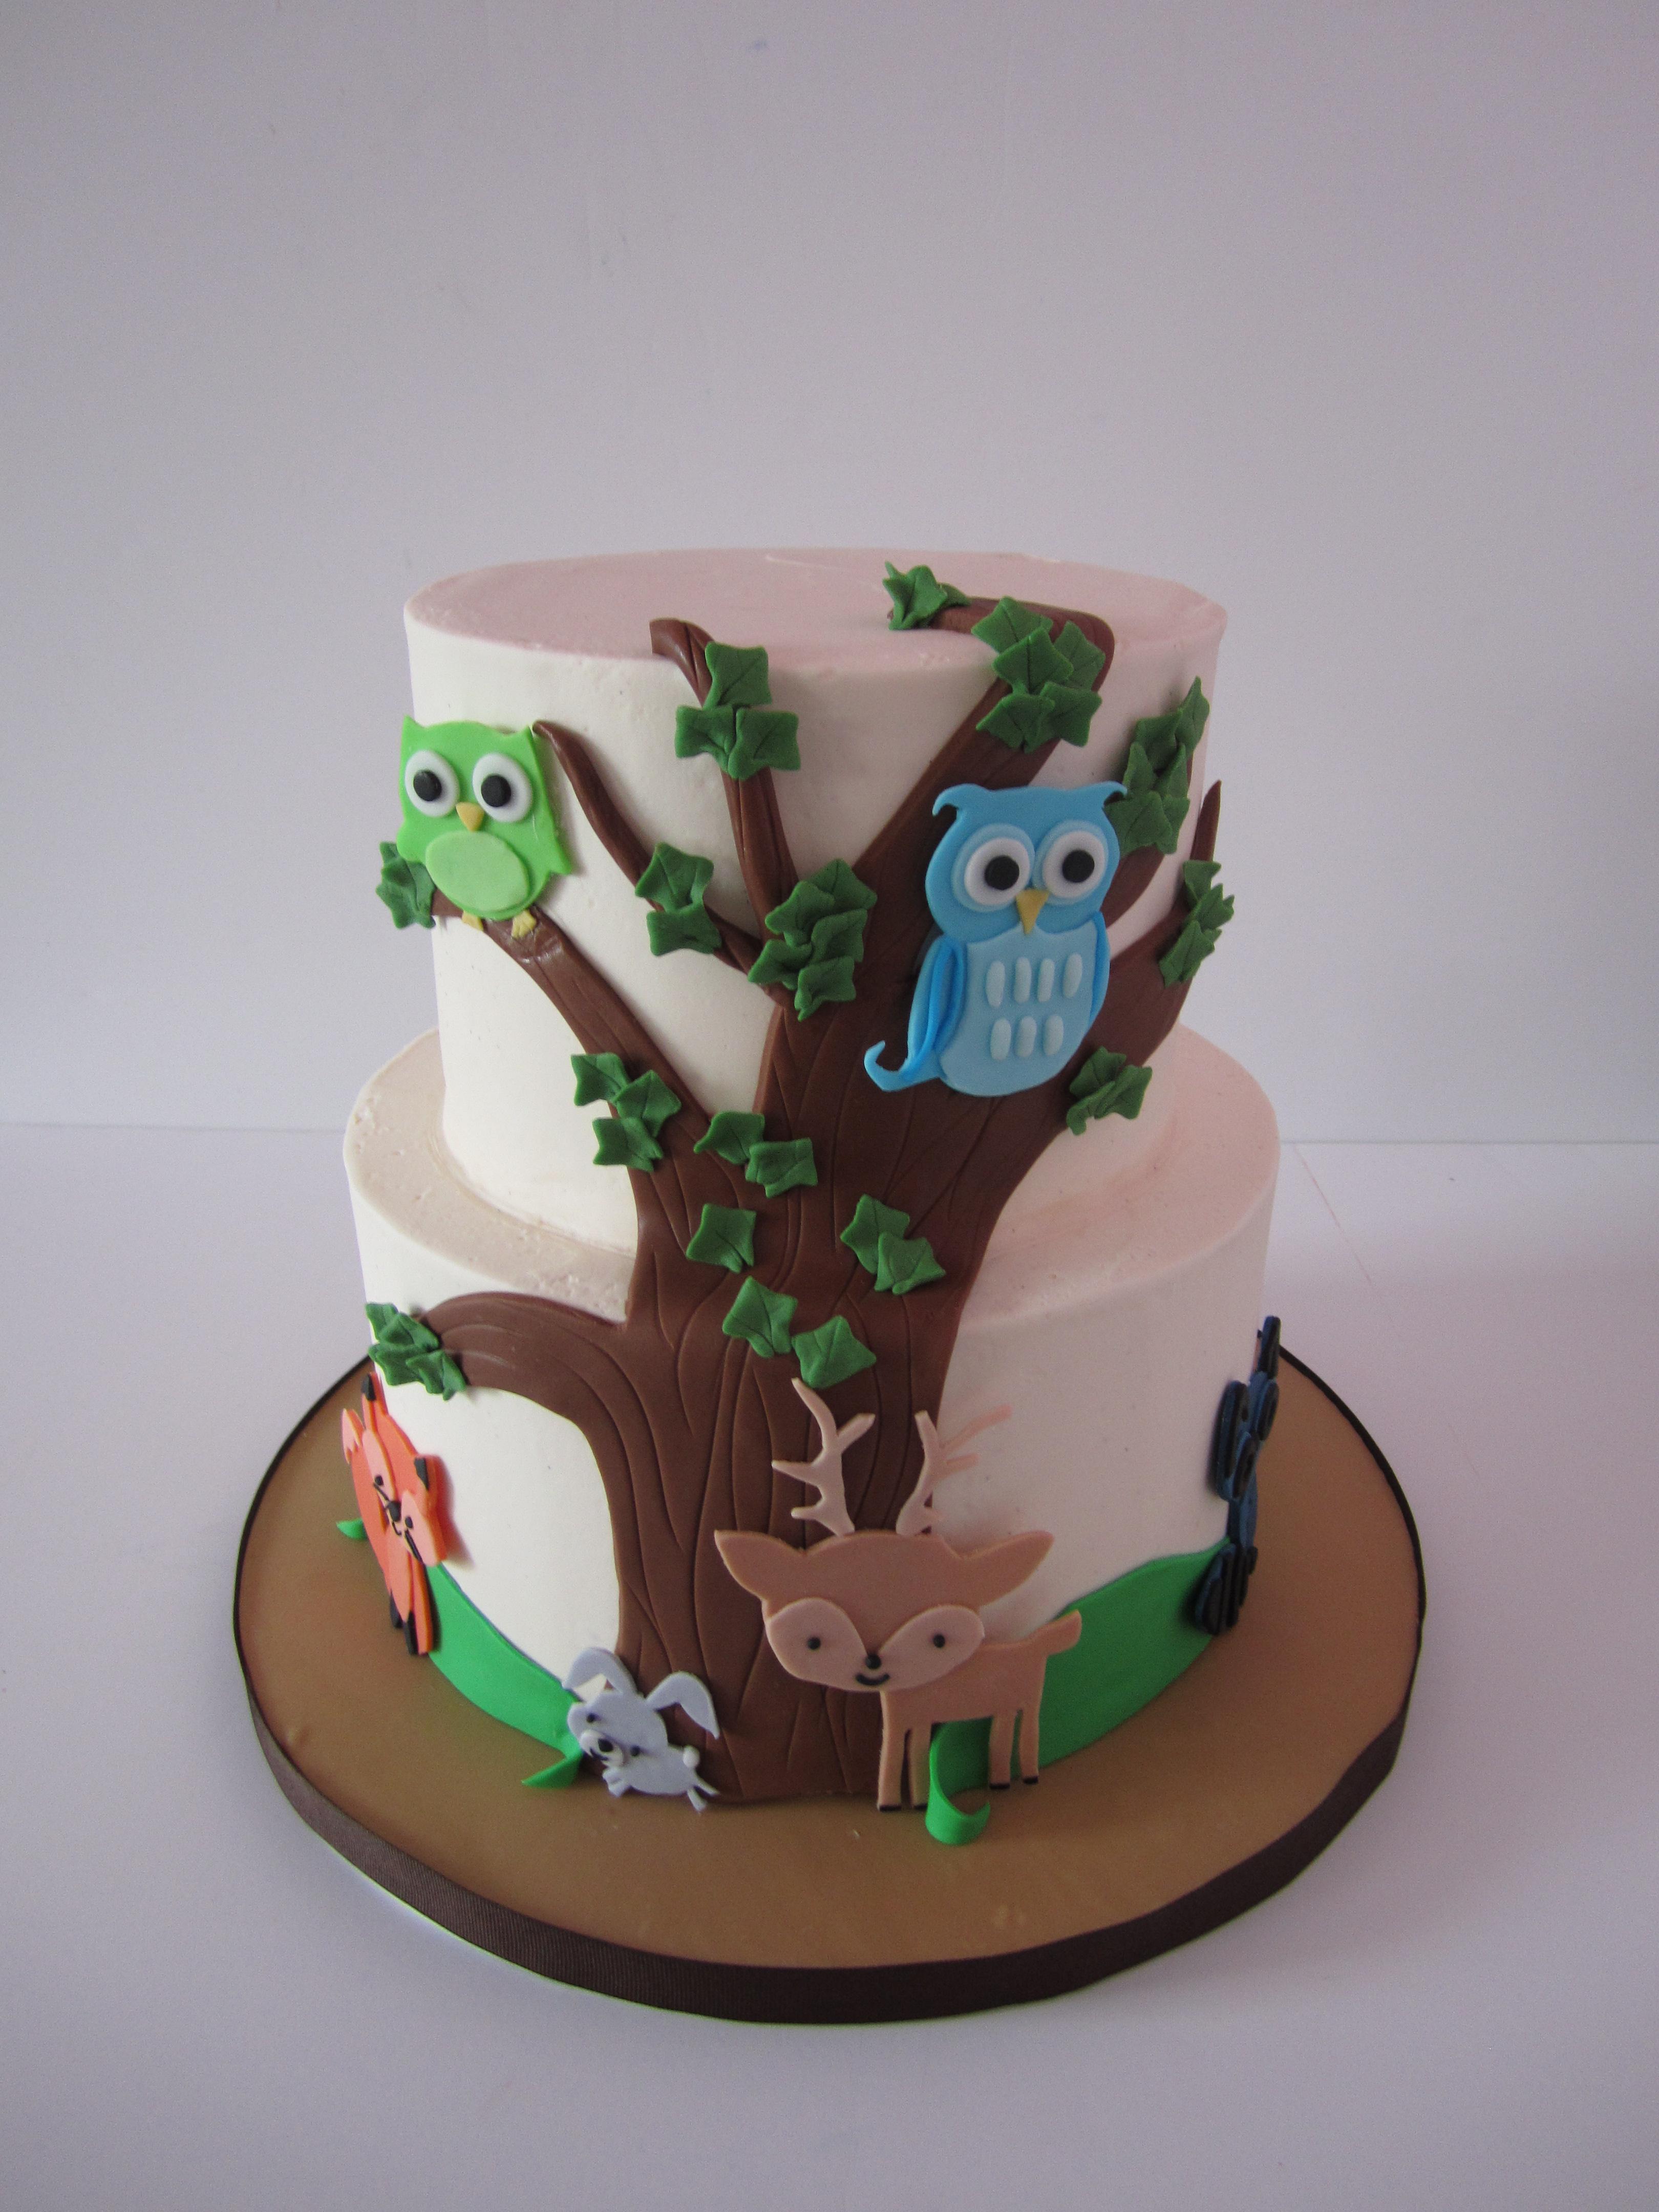 Who Cake